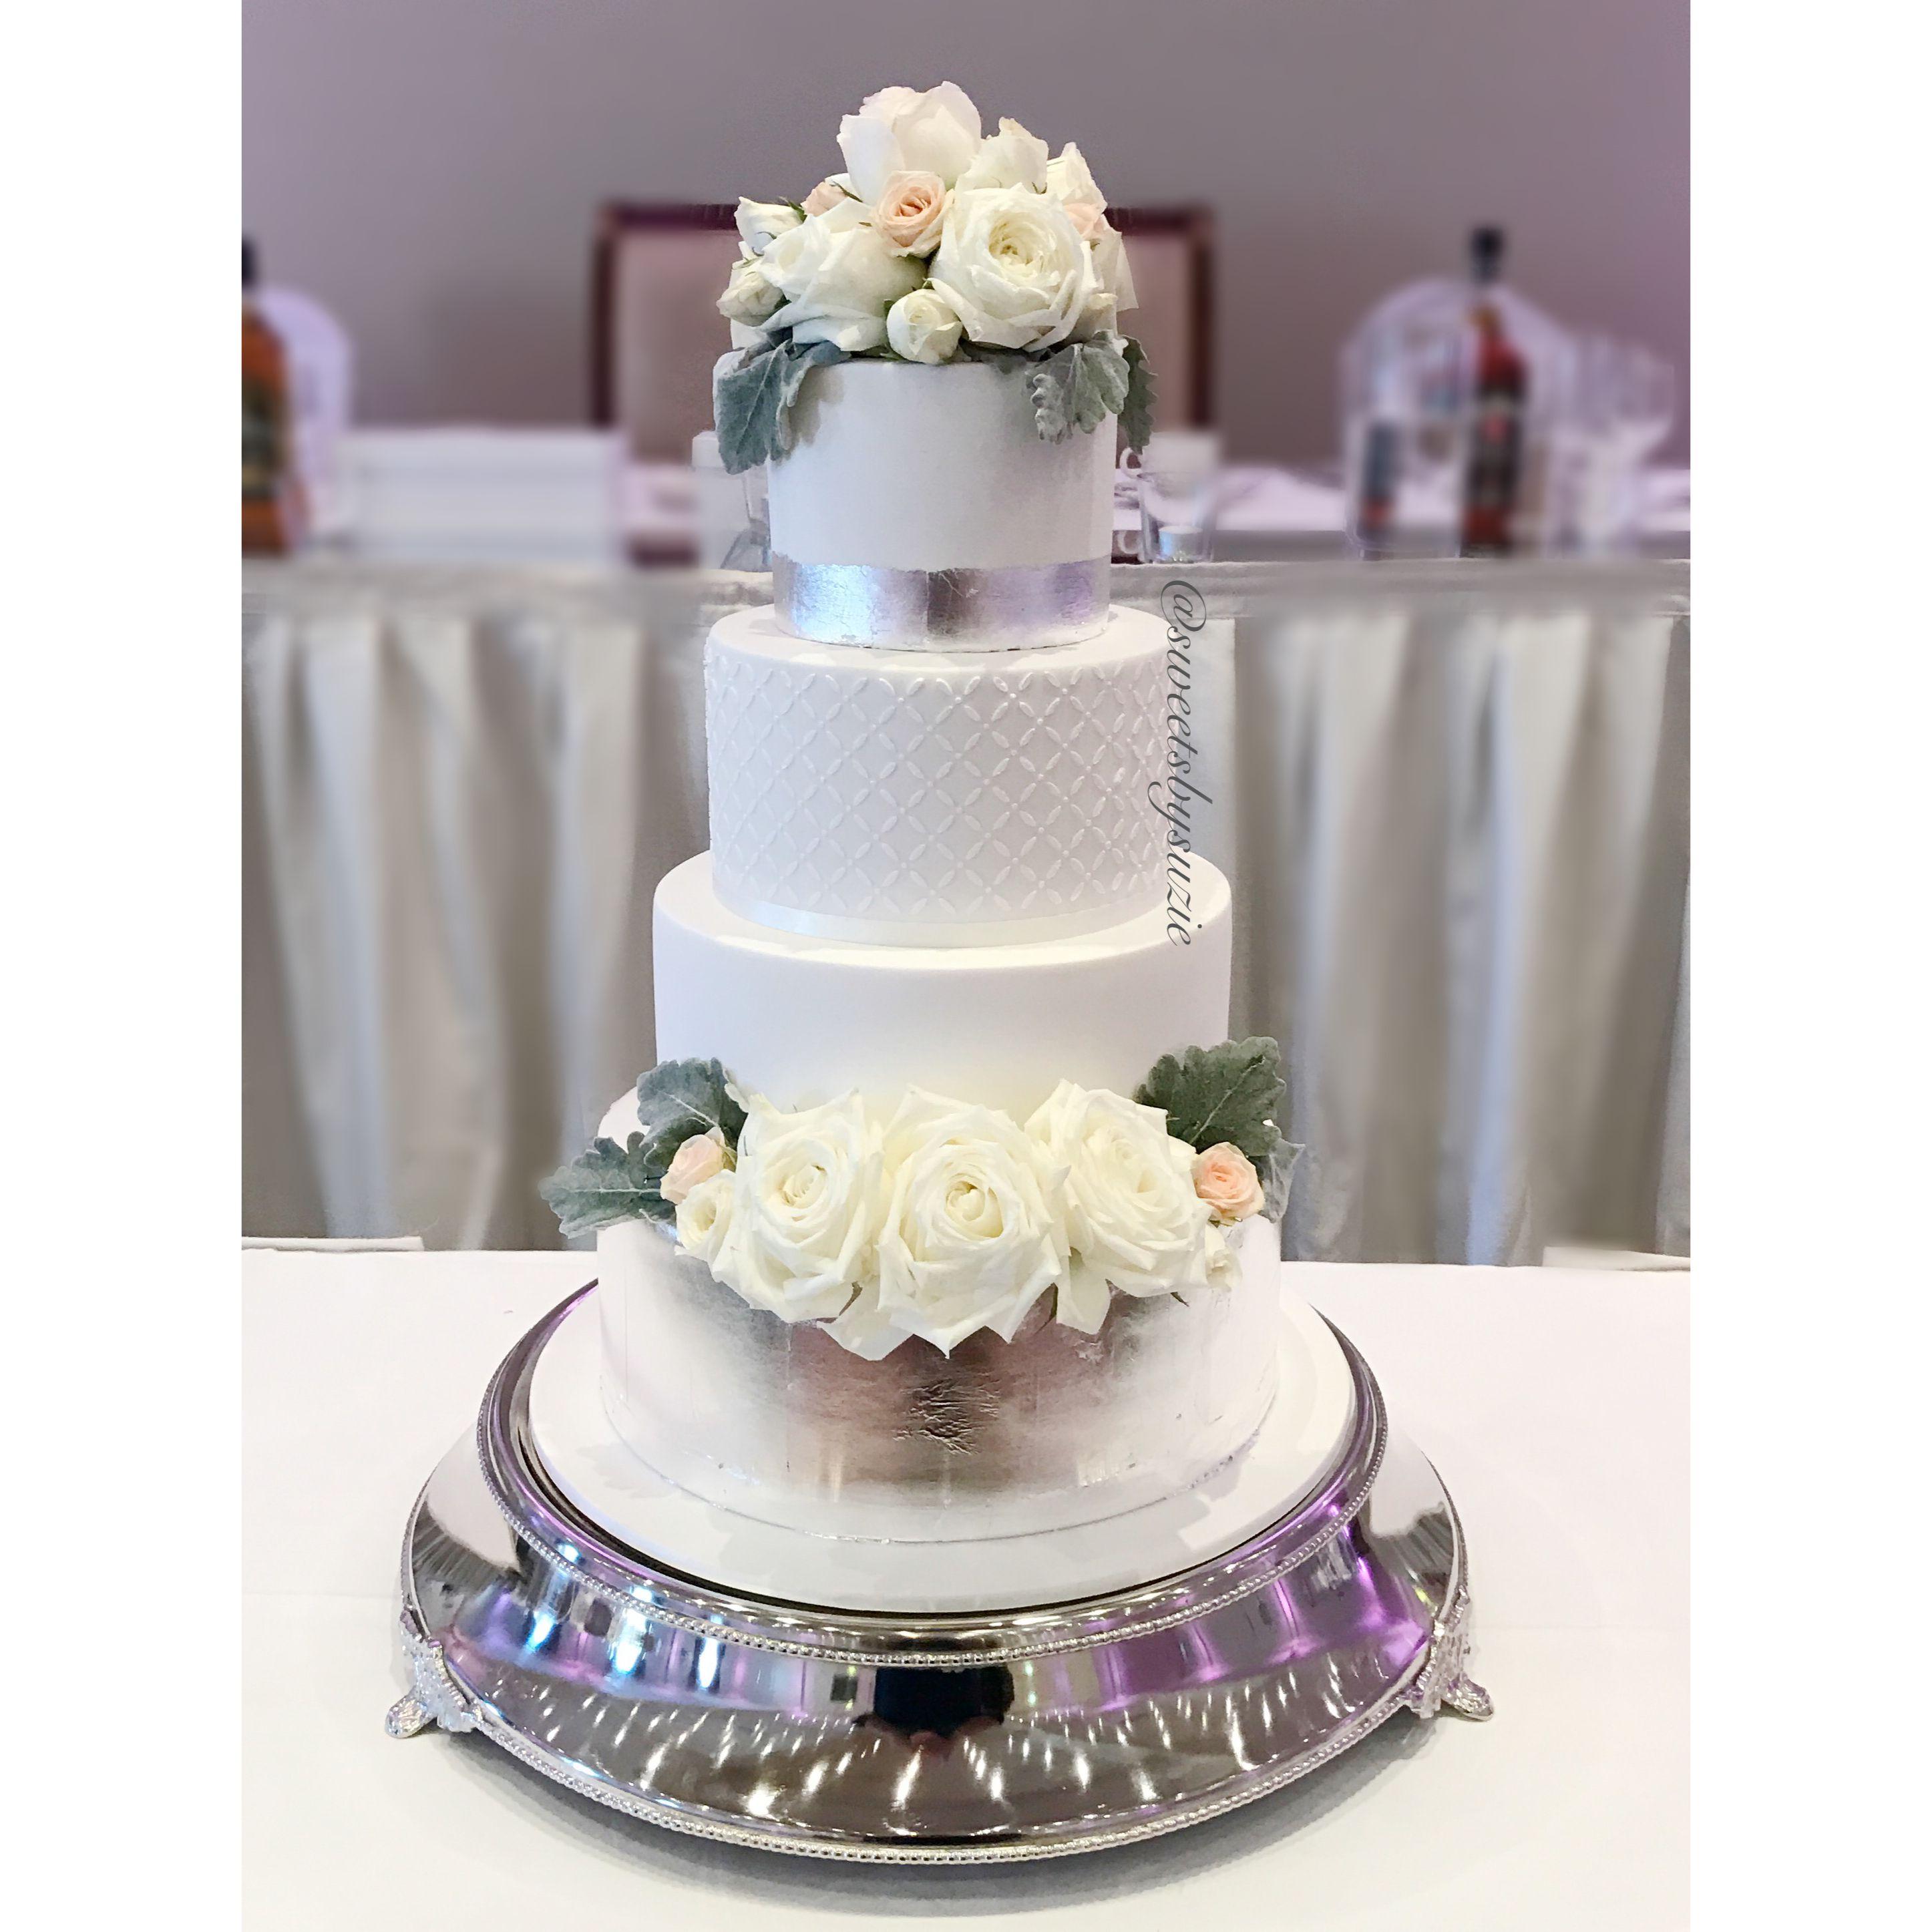 White and SilverLeaf Wedding Cake made by SweetsBySuzie in Melbourne ...